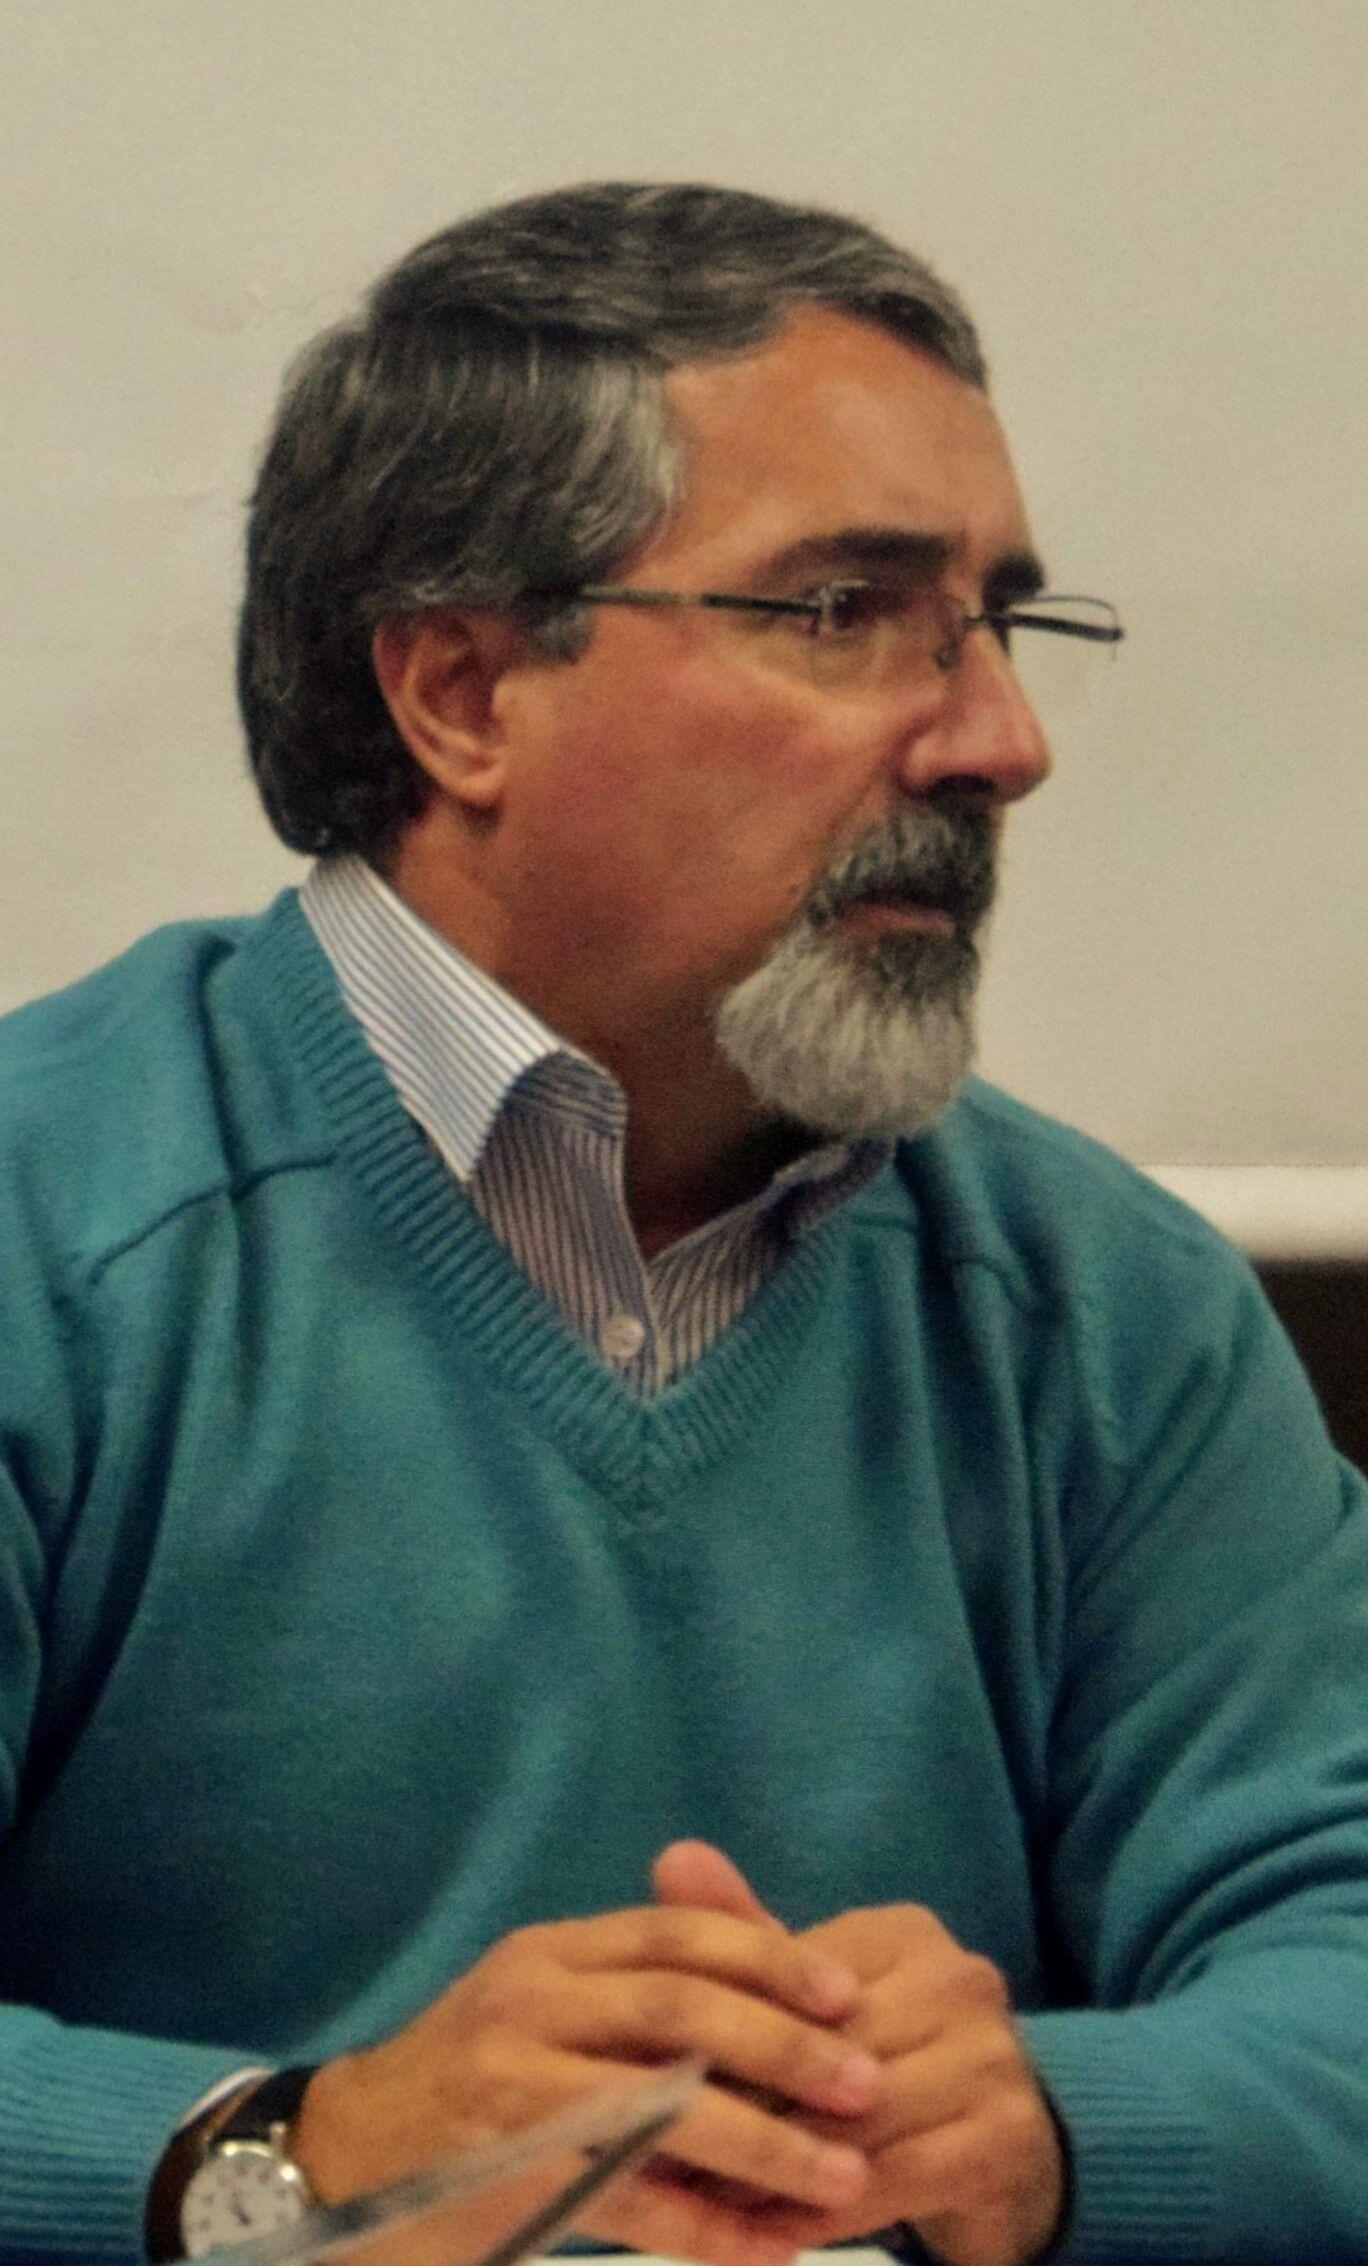 António Souto